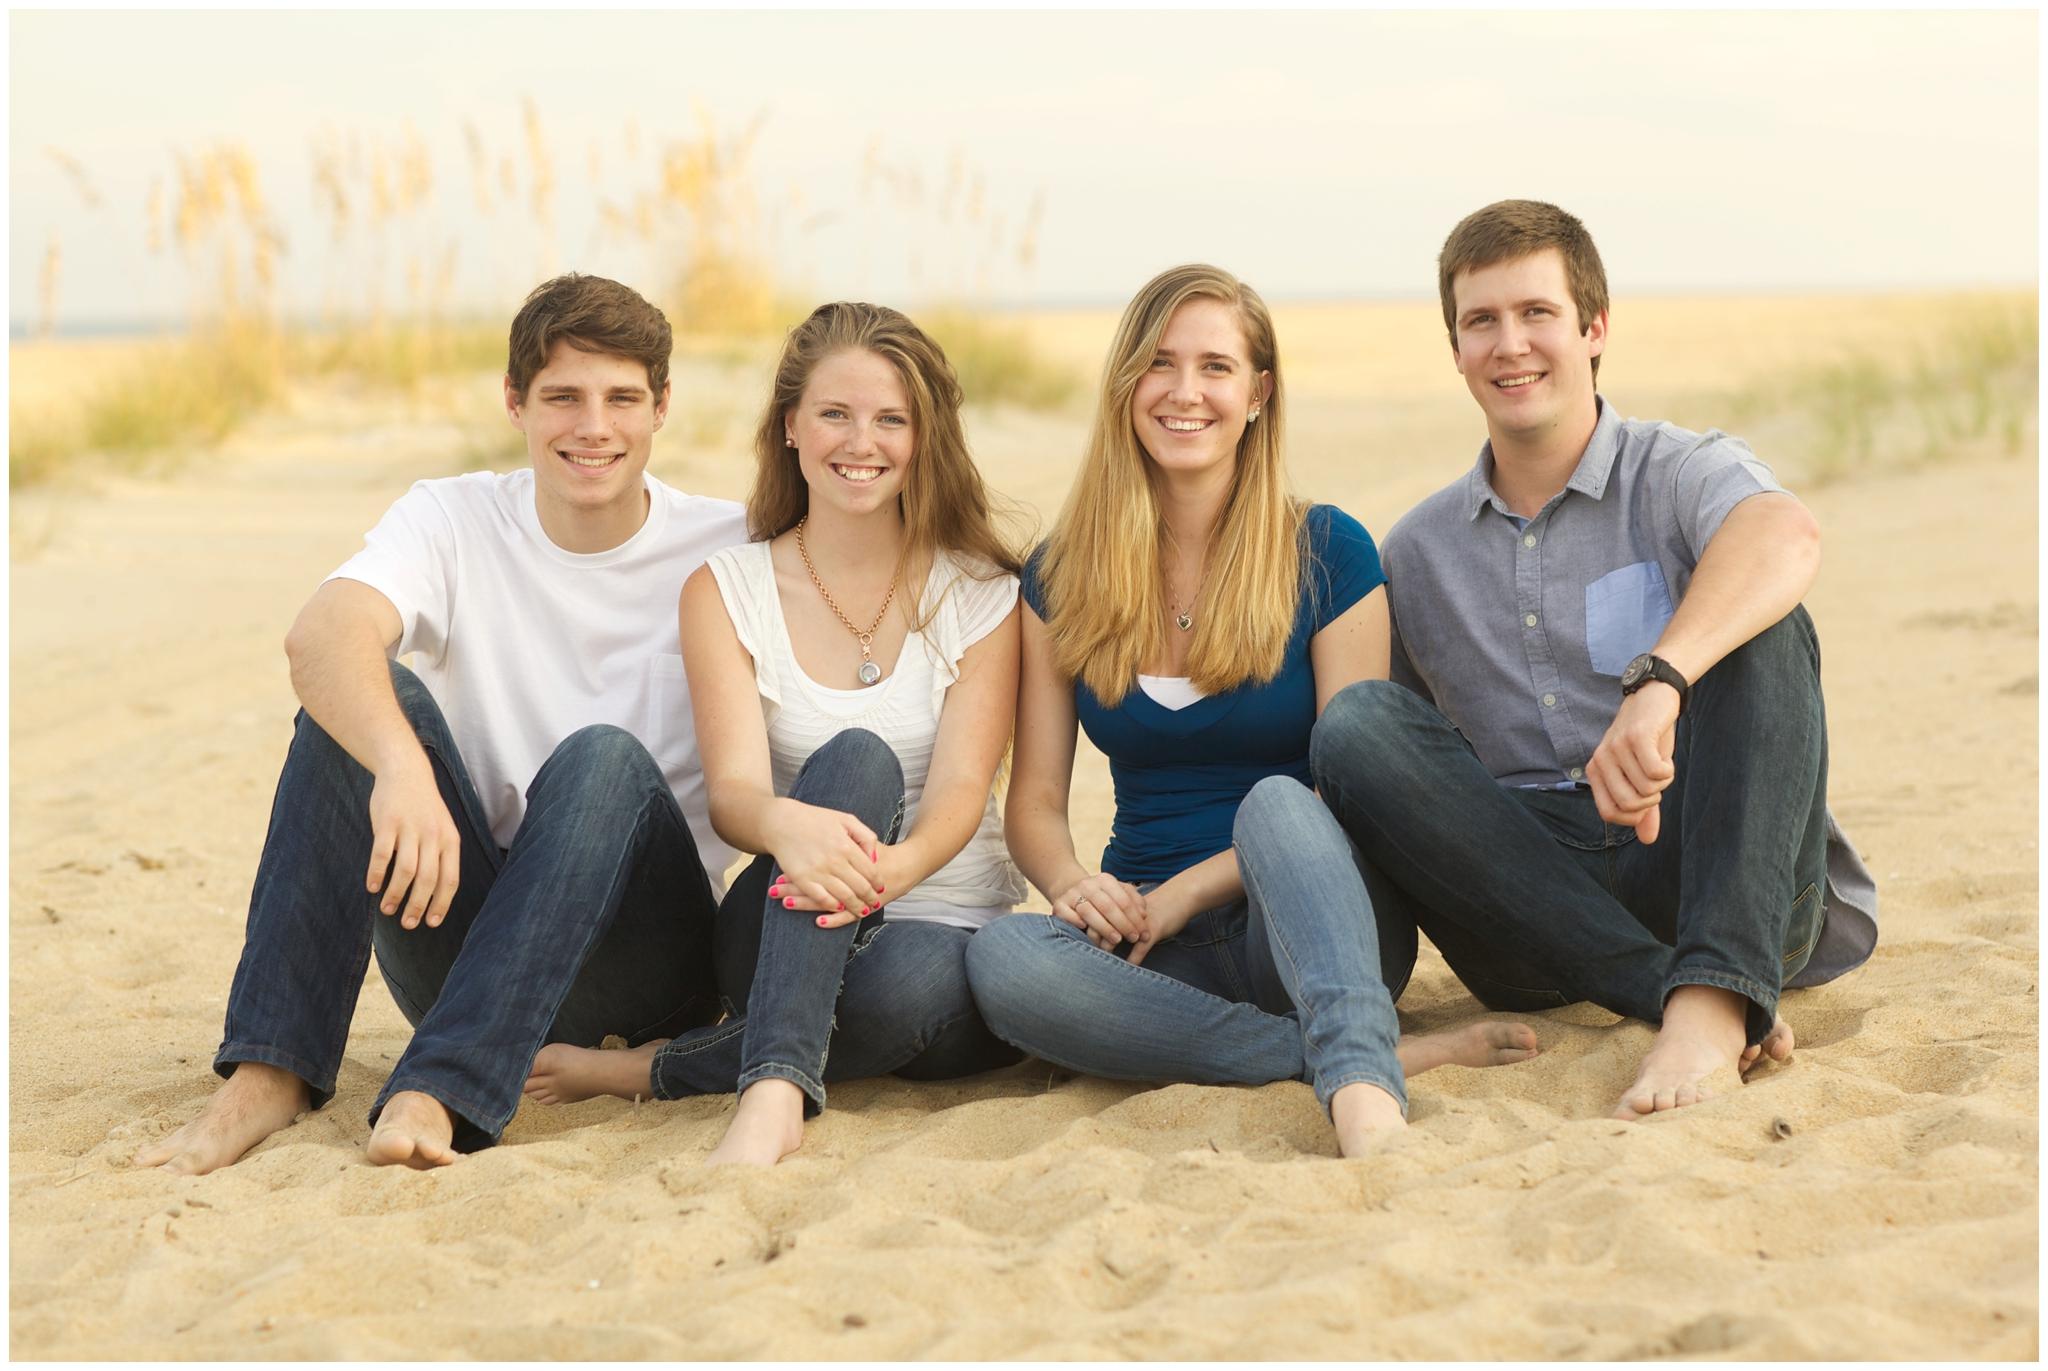 Virginia Beach Large Group Family Photography at the Beach